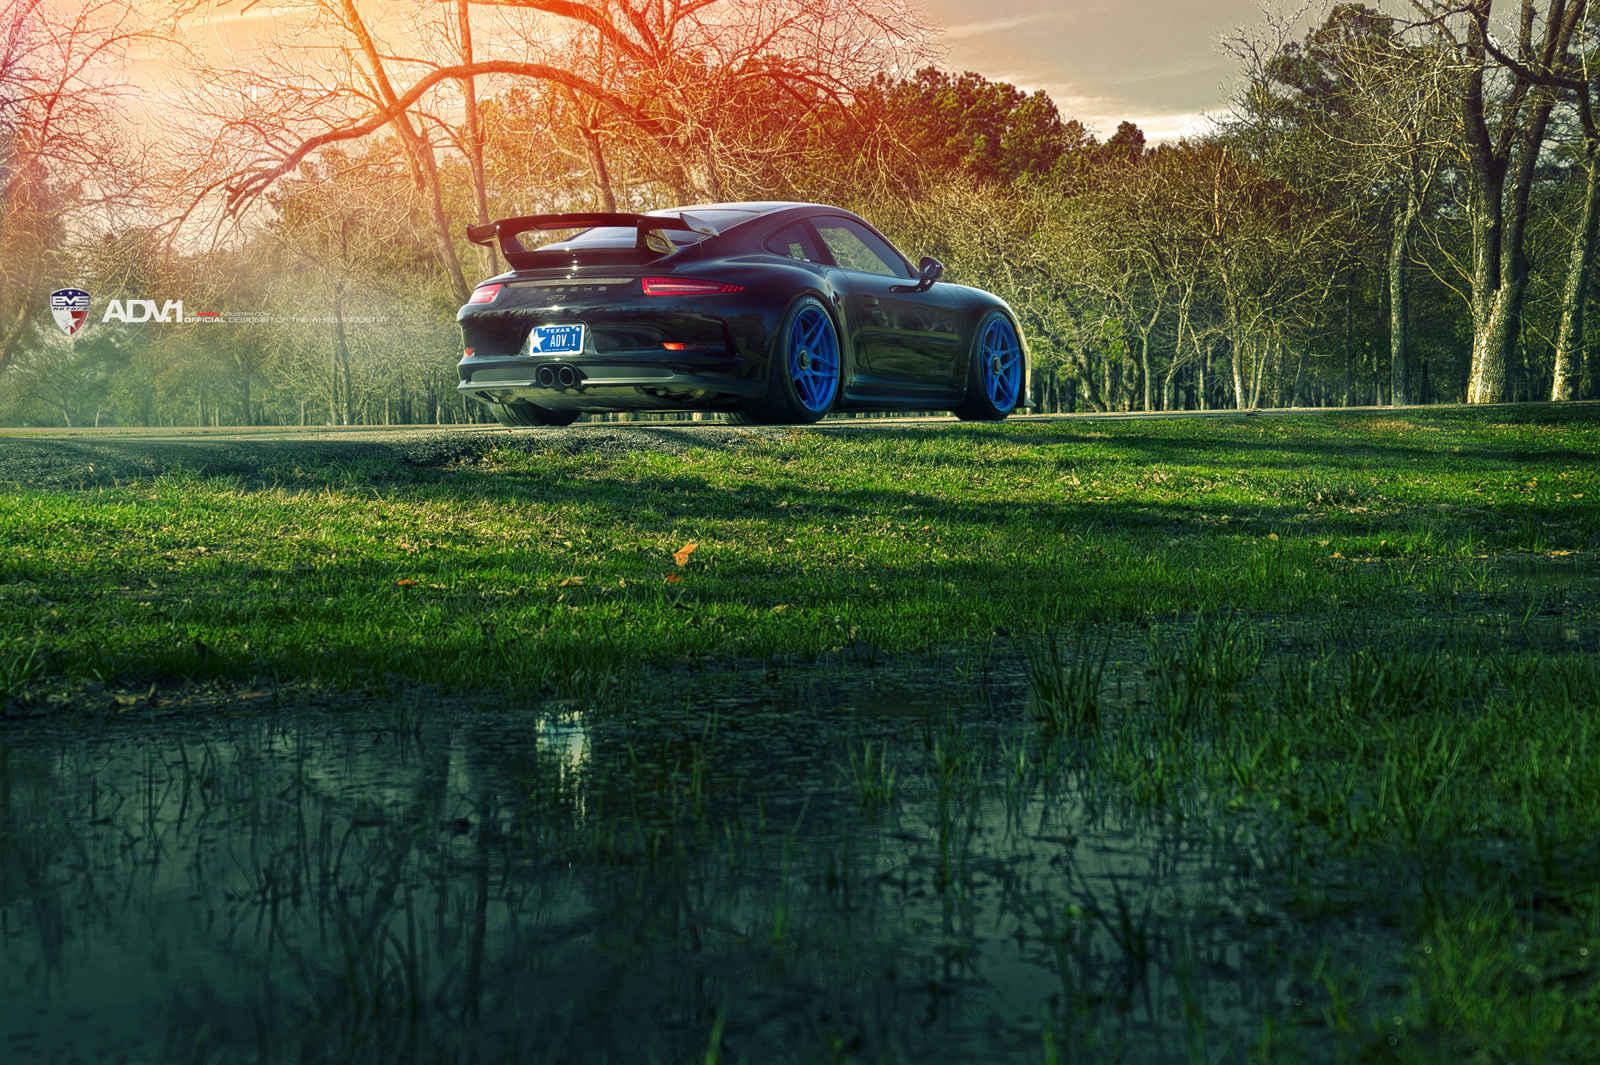 adv1-porsche-991-gt3-adv05s-mv2-sl-custom-forged-2-piece-concave-wheels-blue-08